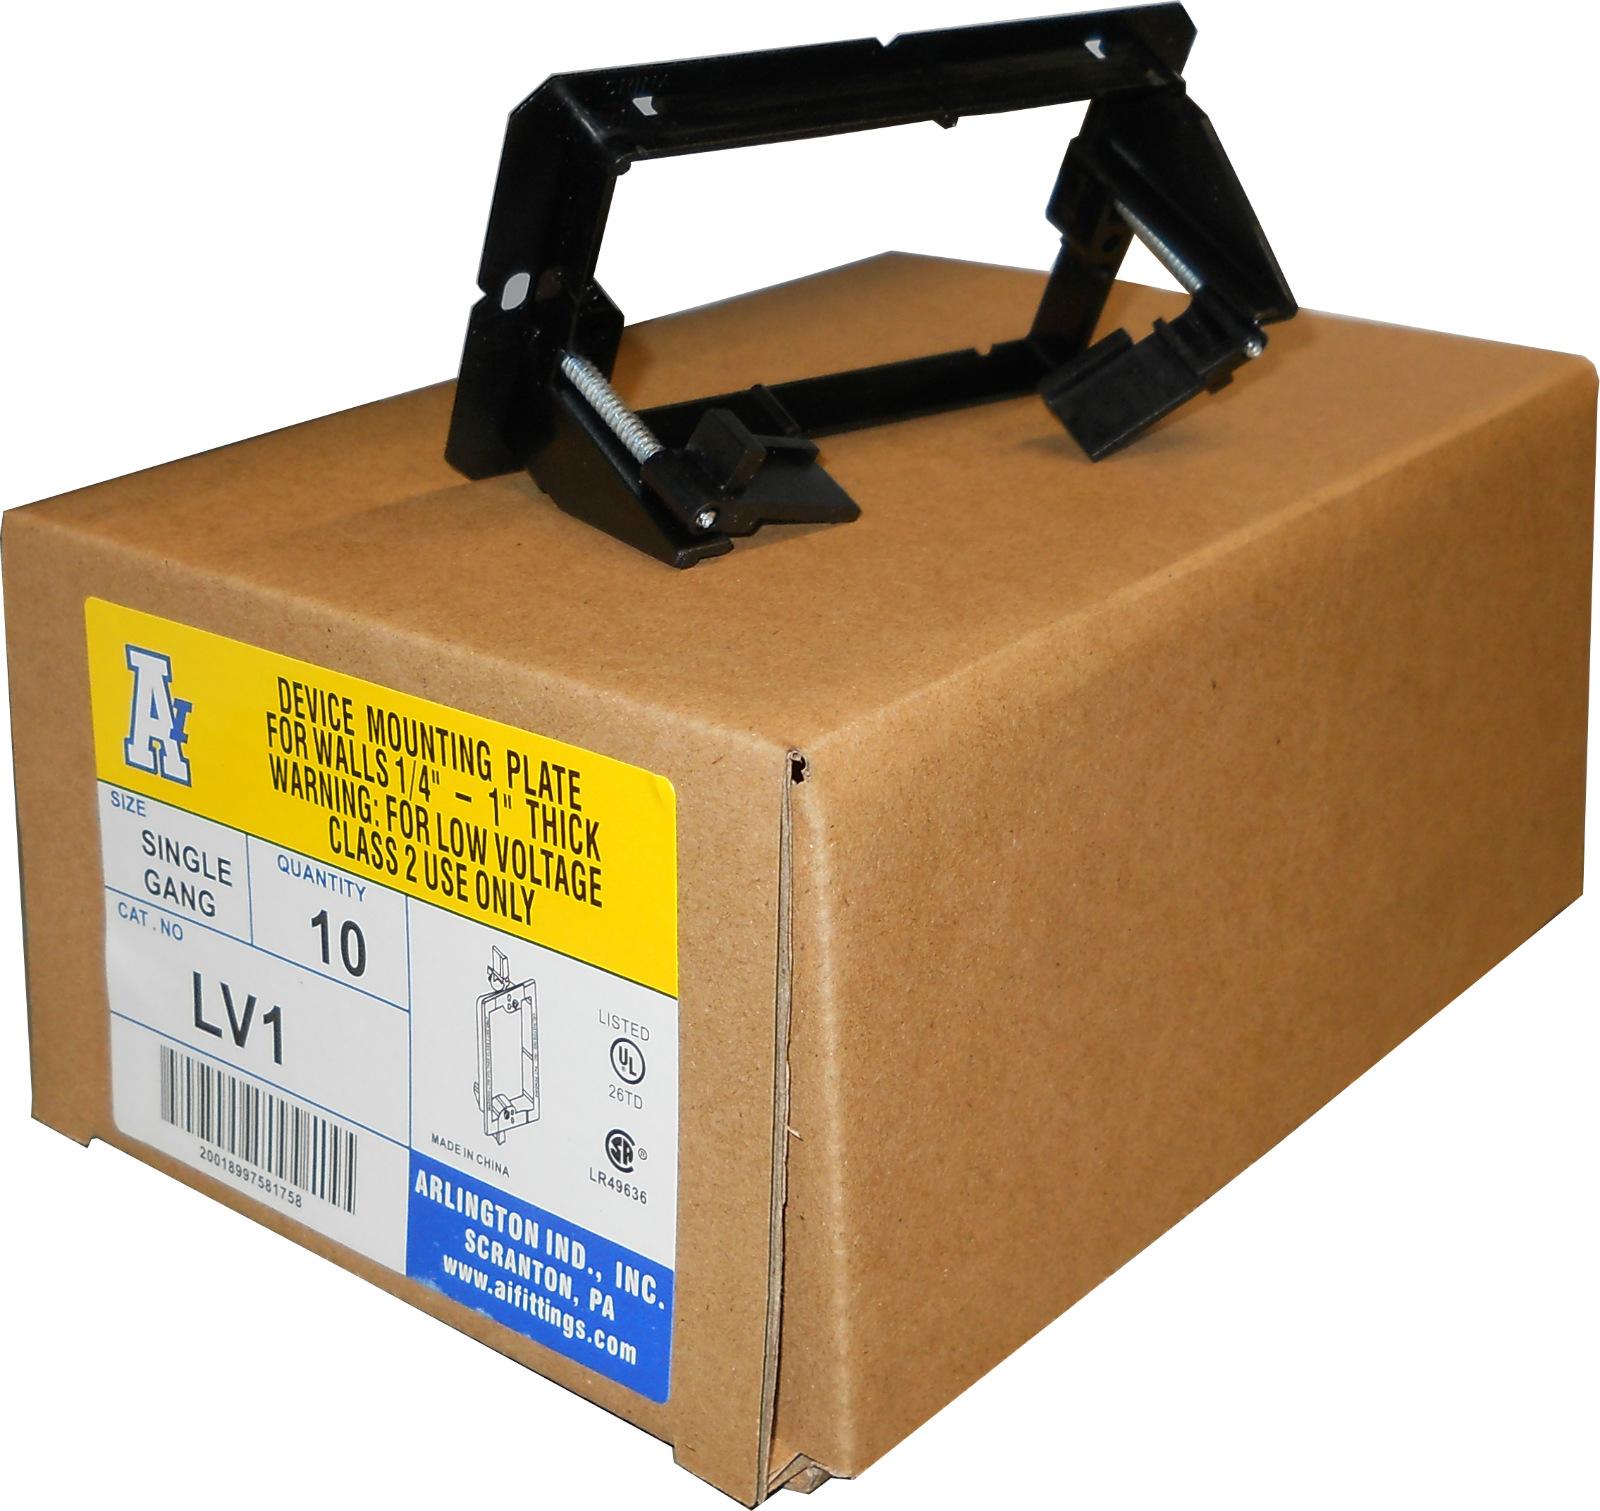 Arlington Lv1 Low Voltage Mounting Bracket 1 Gang Black